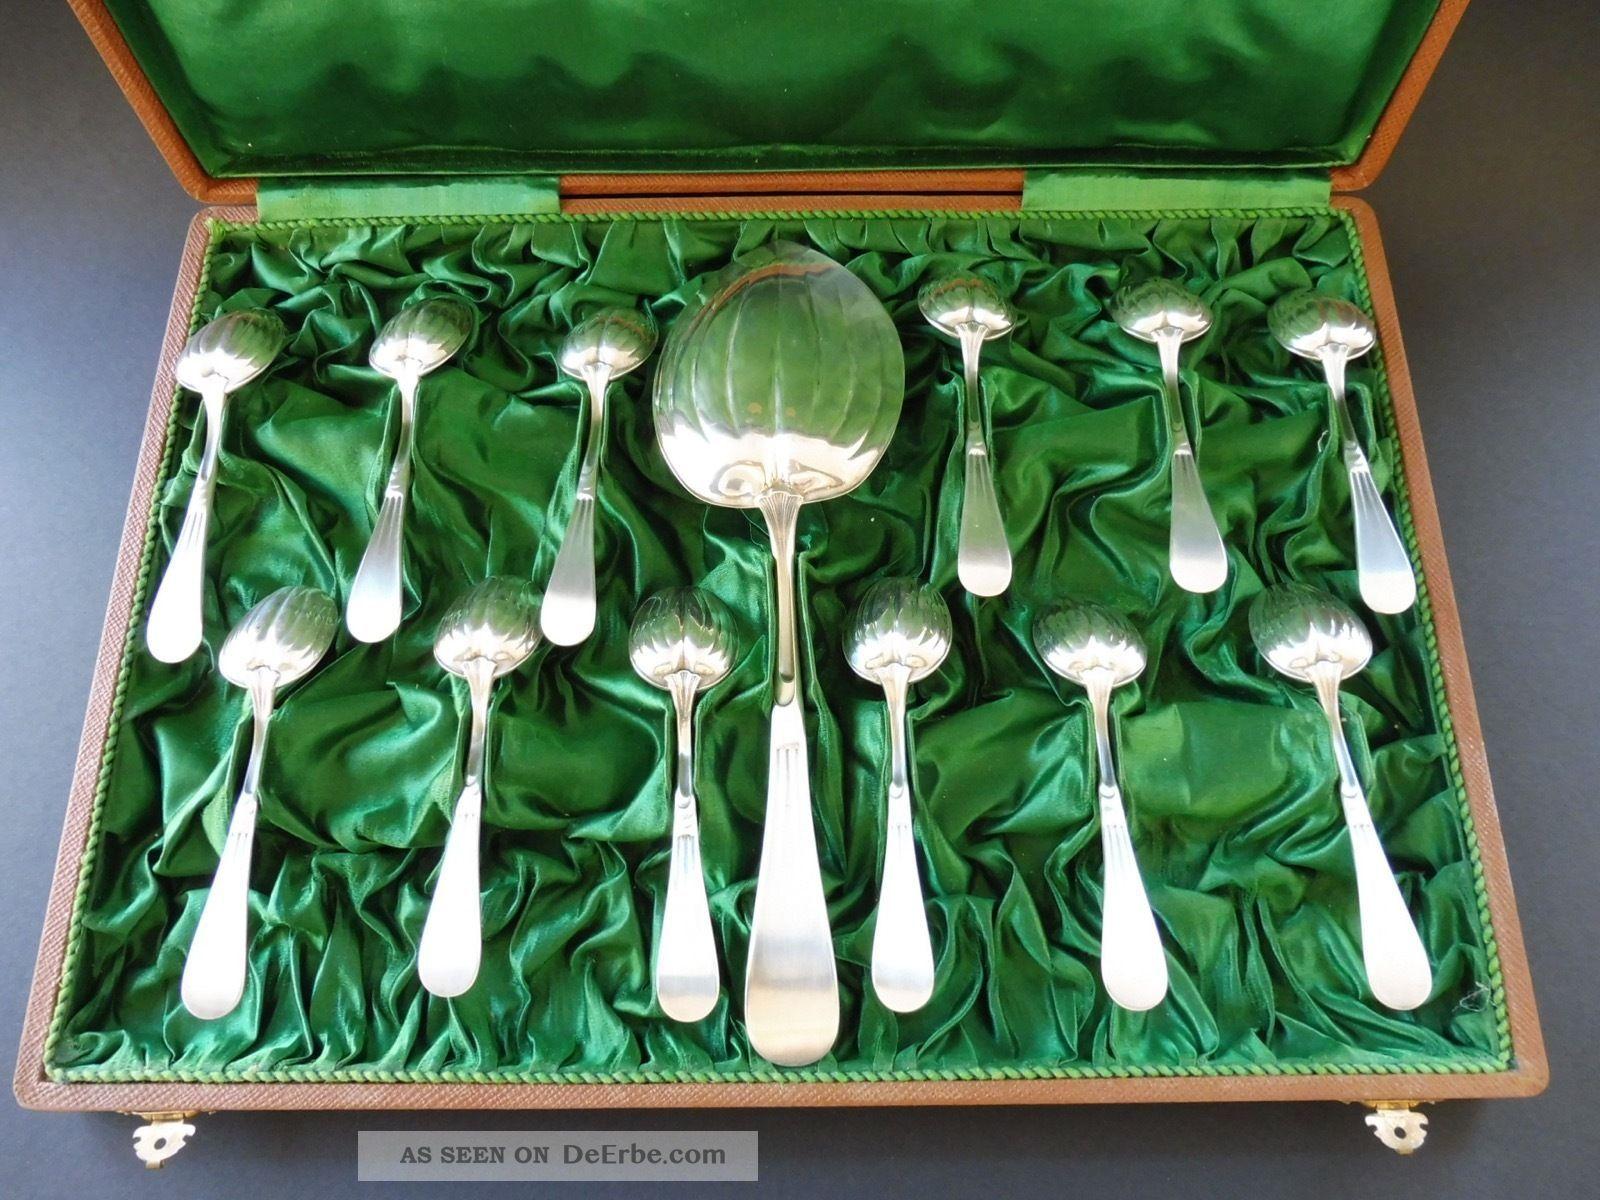 christofle paris jugendstil besteck ice cream dessert 12 p art nouveau cutlery. Black Bedroom Furniture Sets. Home Design Ideas